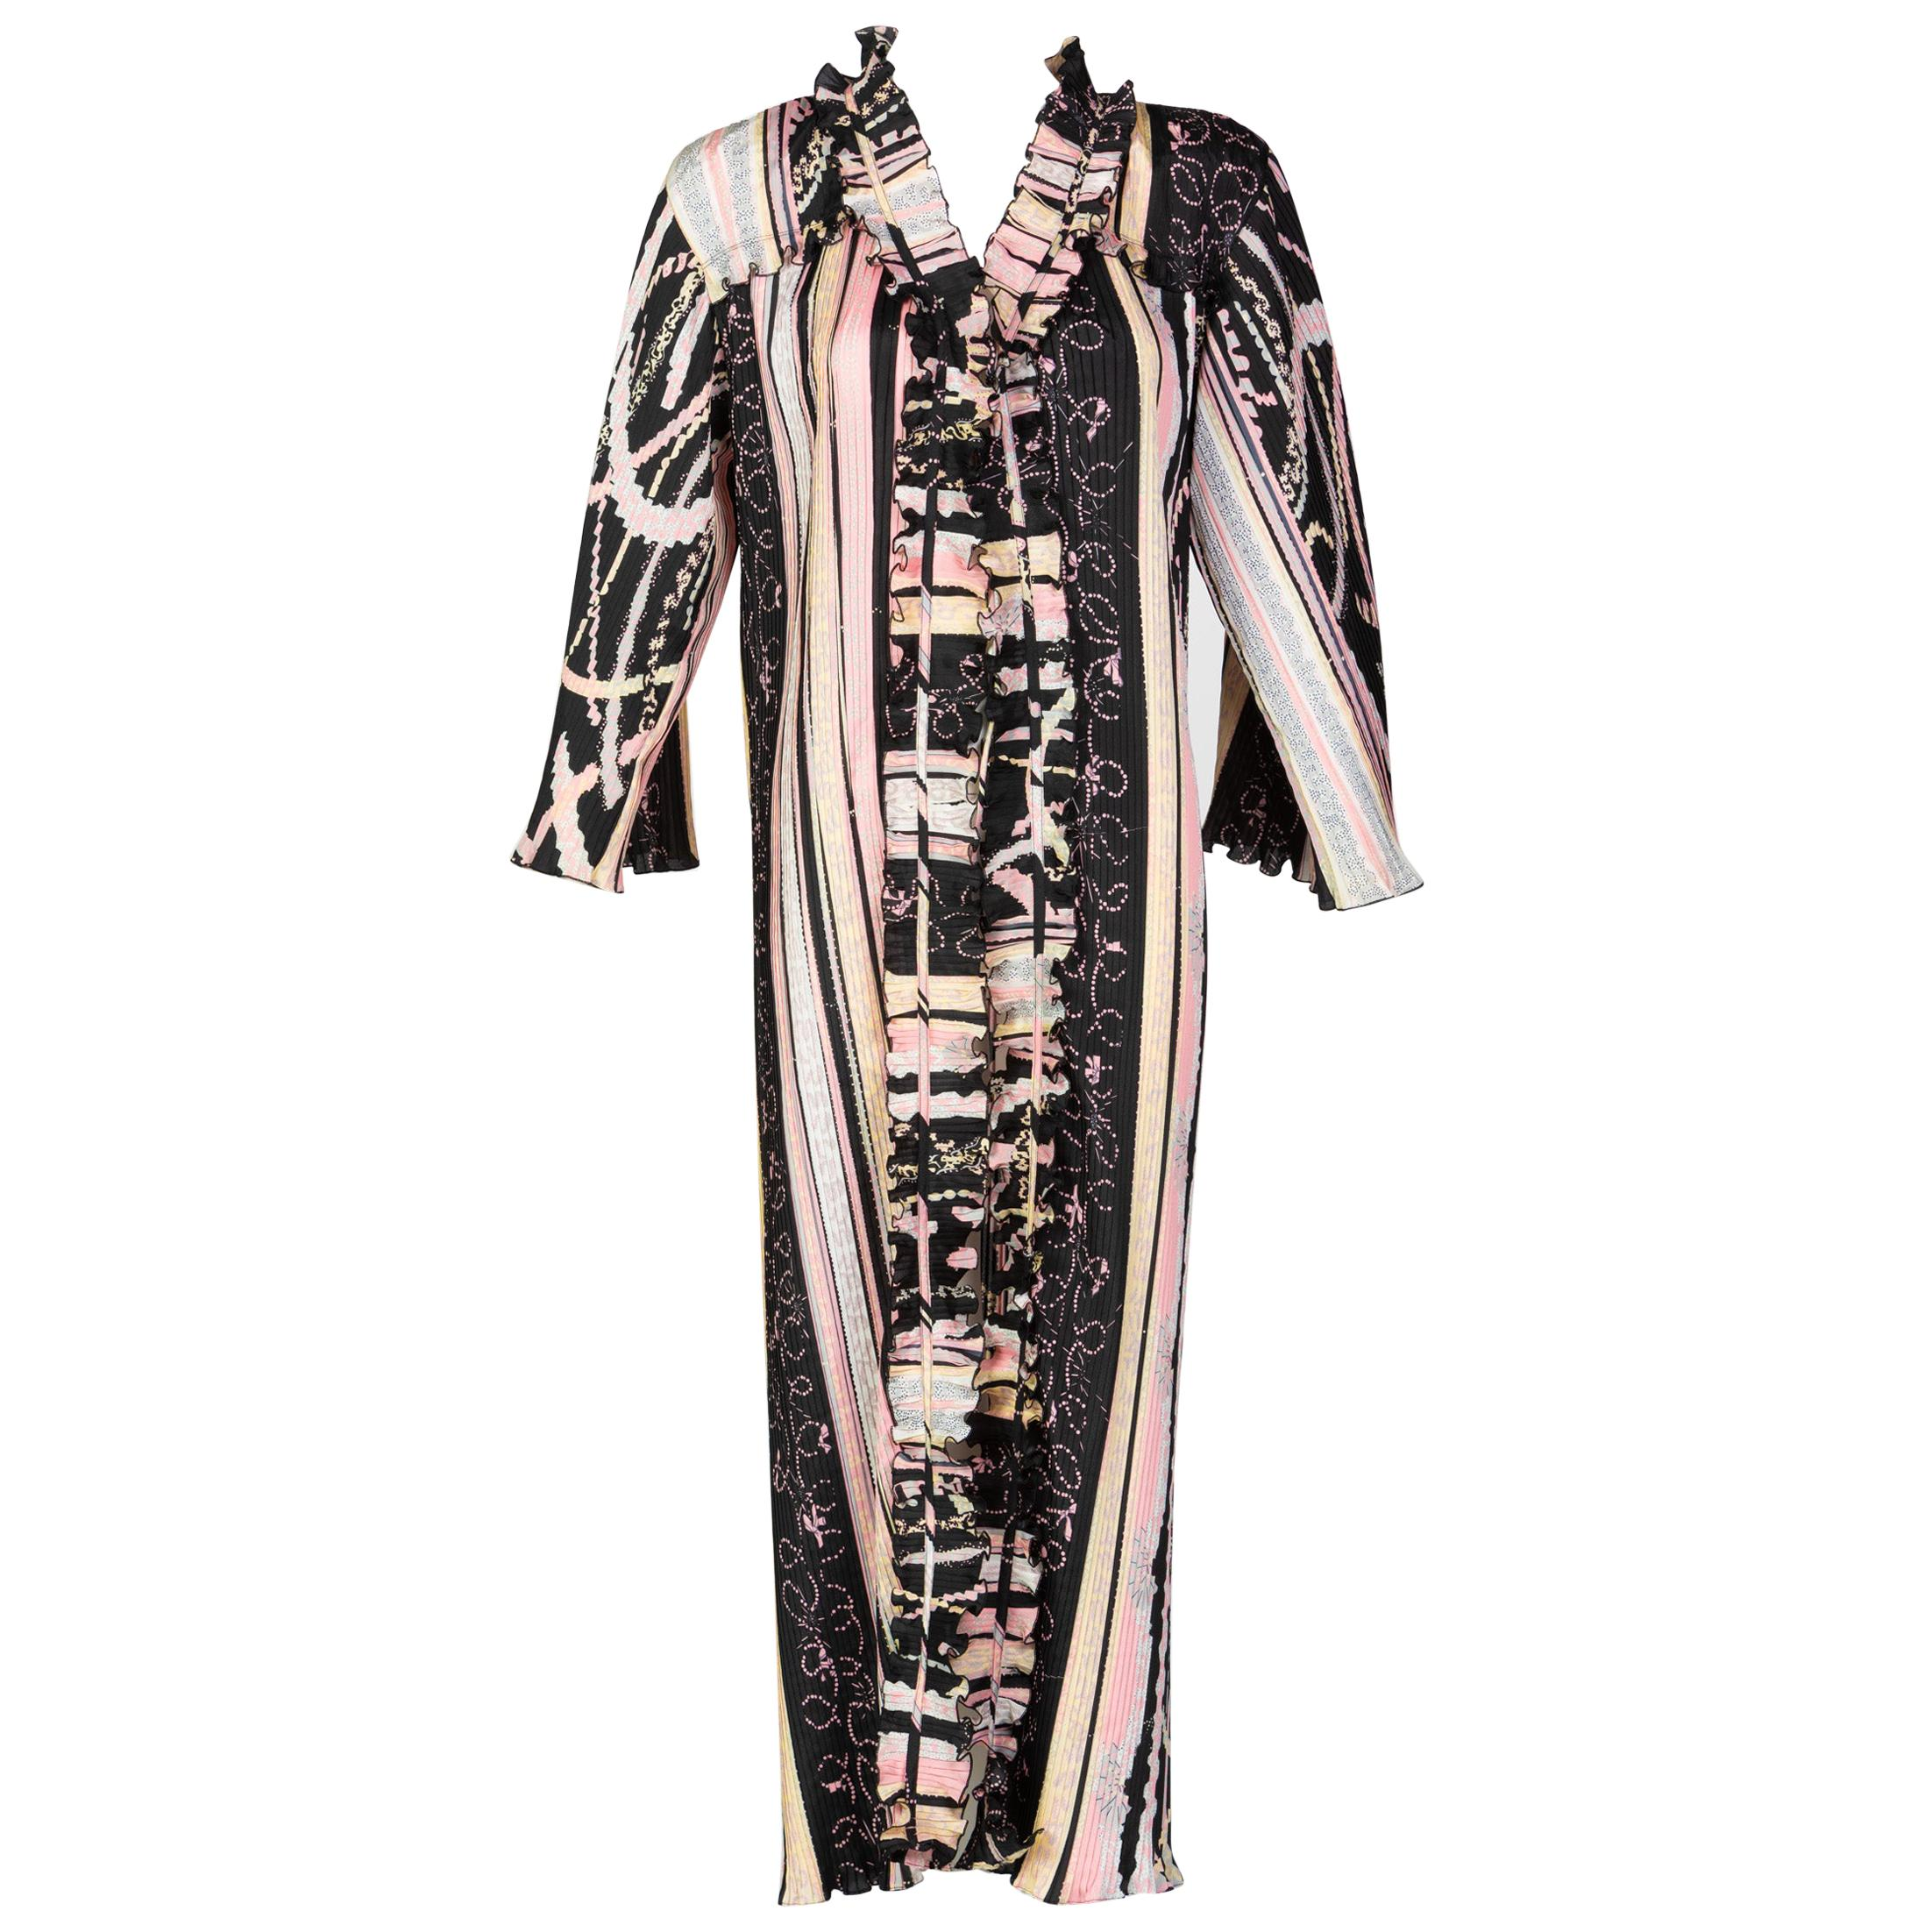 31898ec84da Basha Gold Clothing - 1stdibs